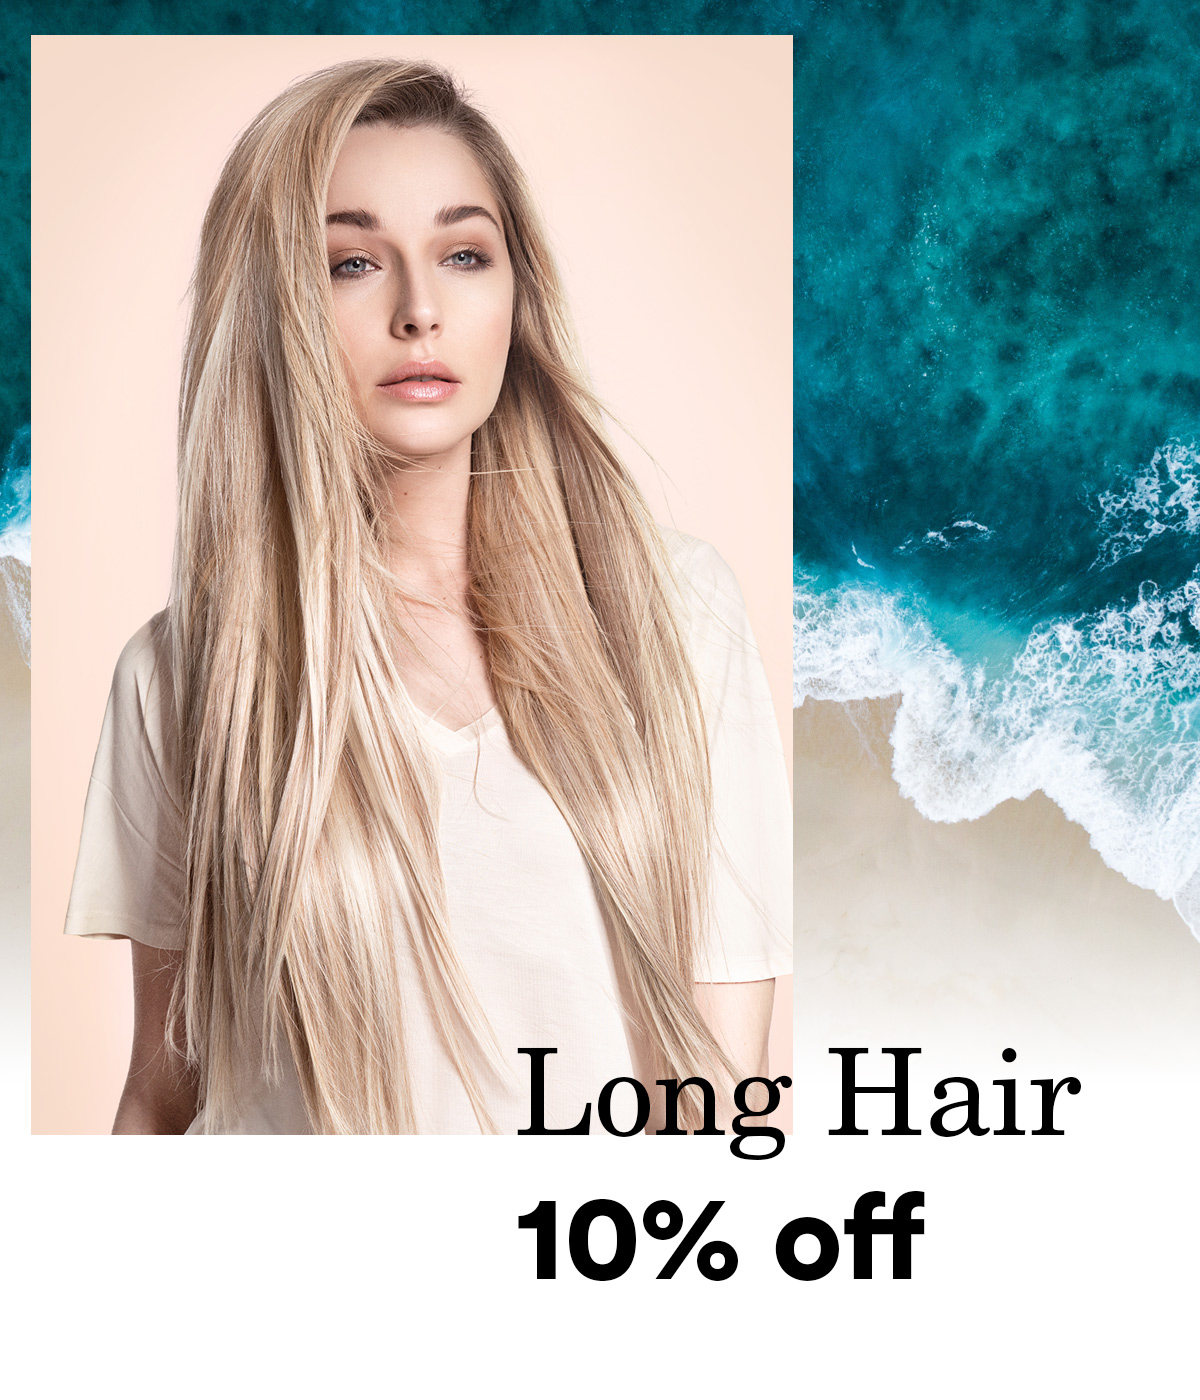 Long Hair - 10% off